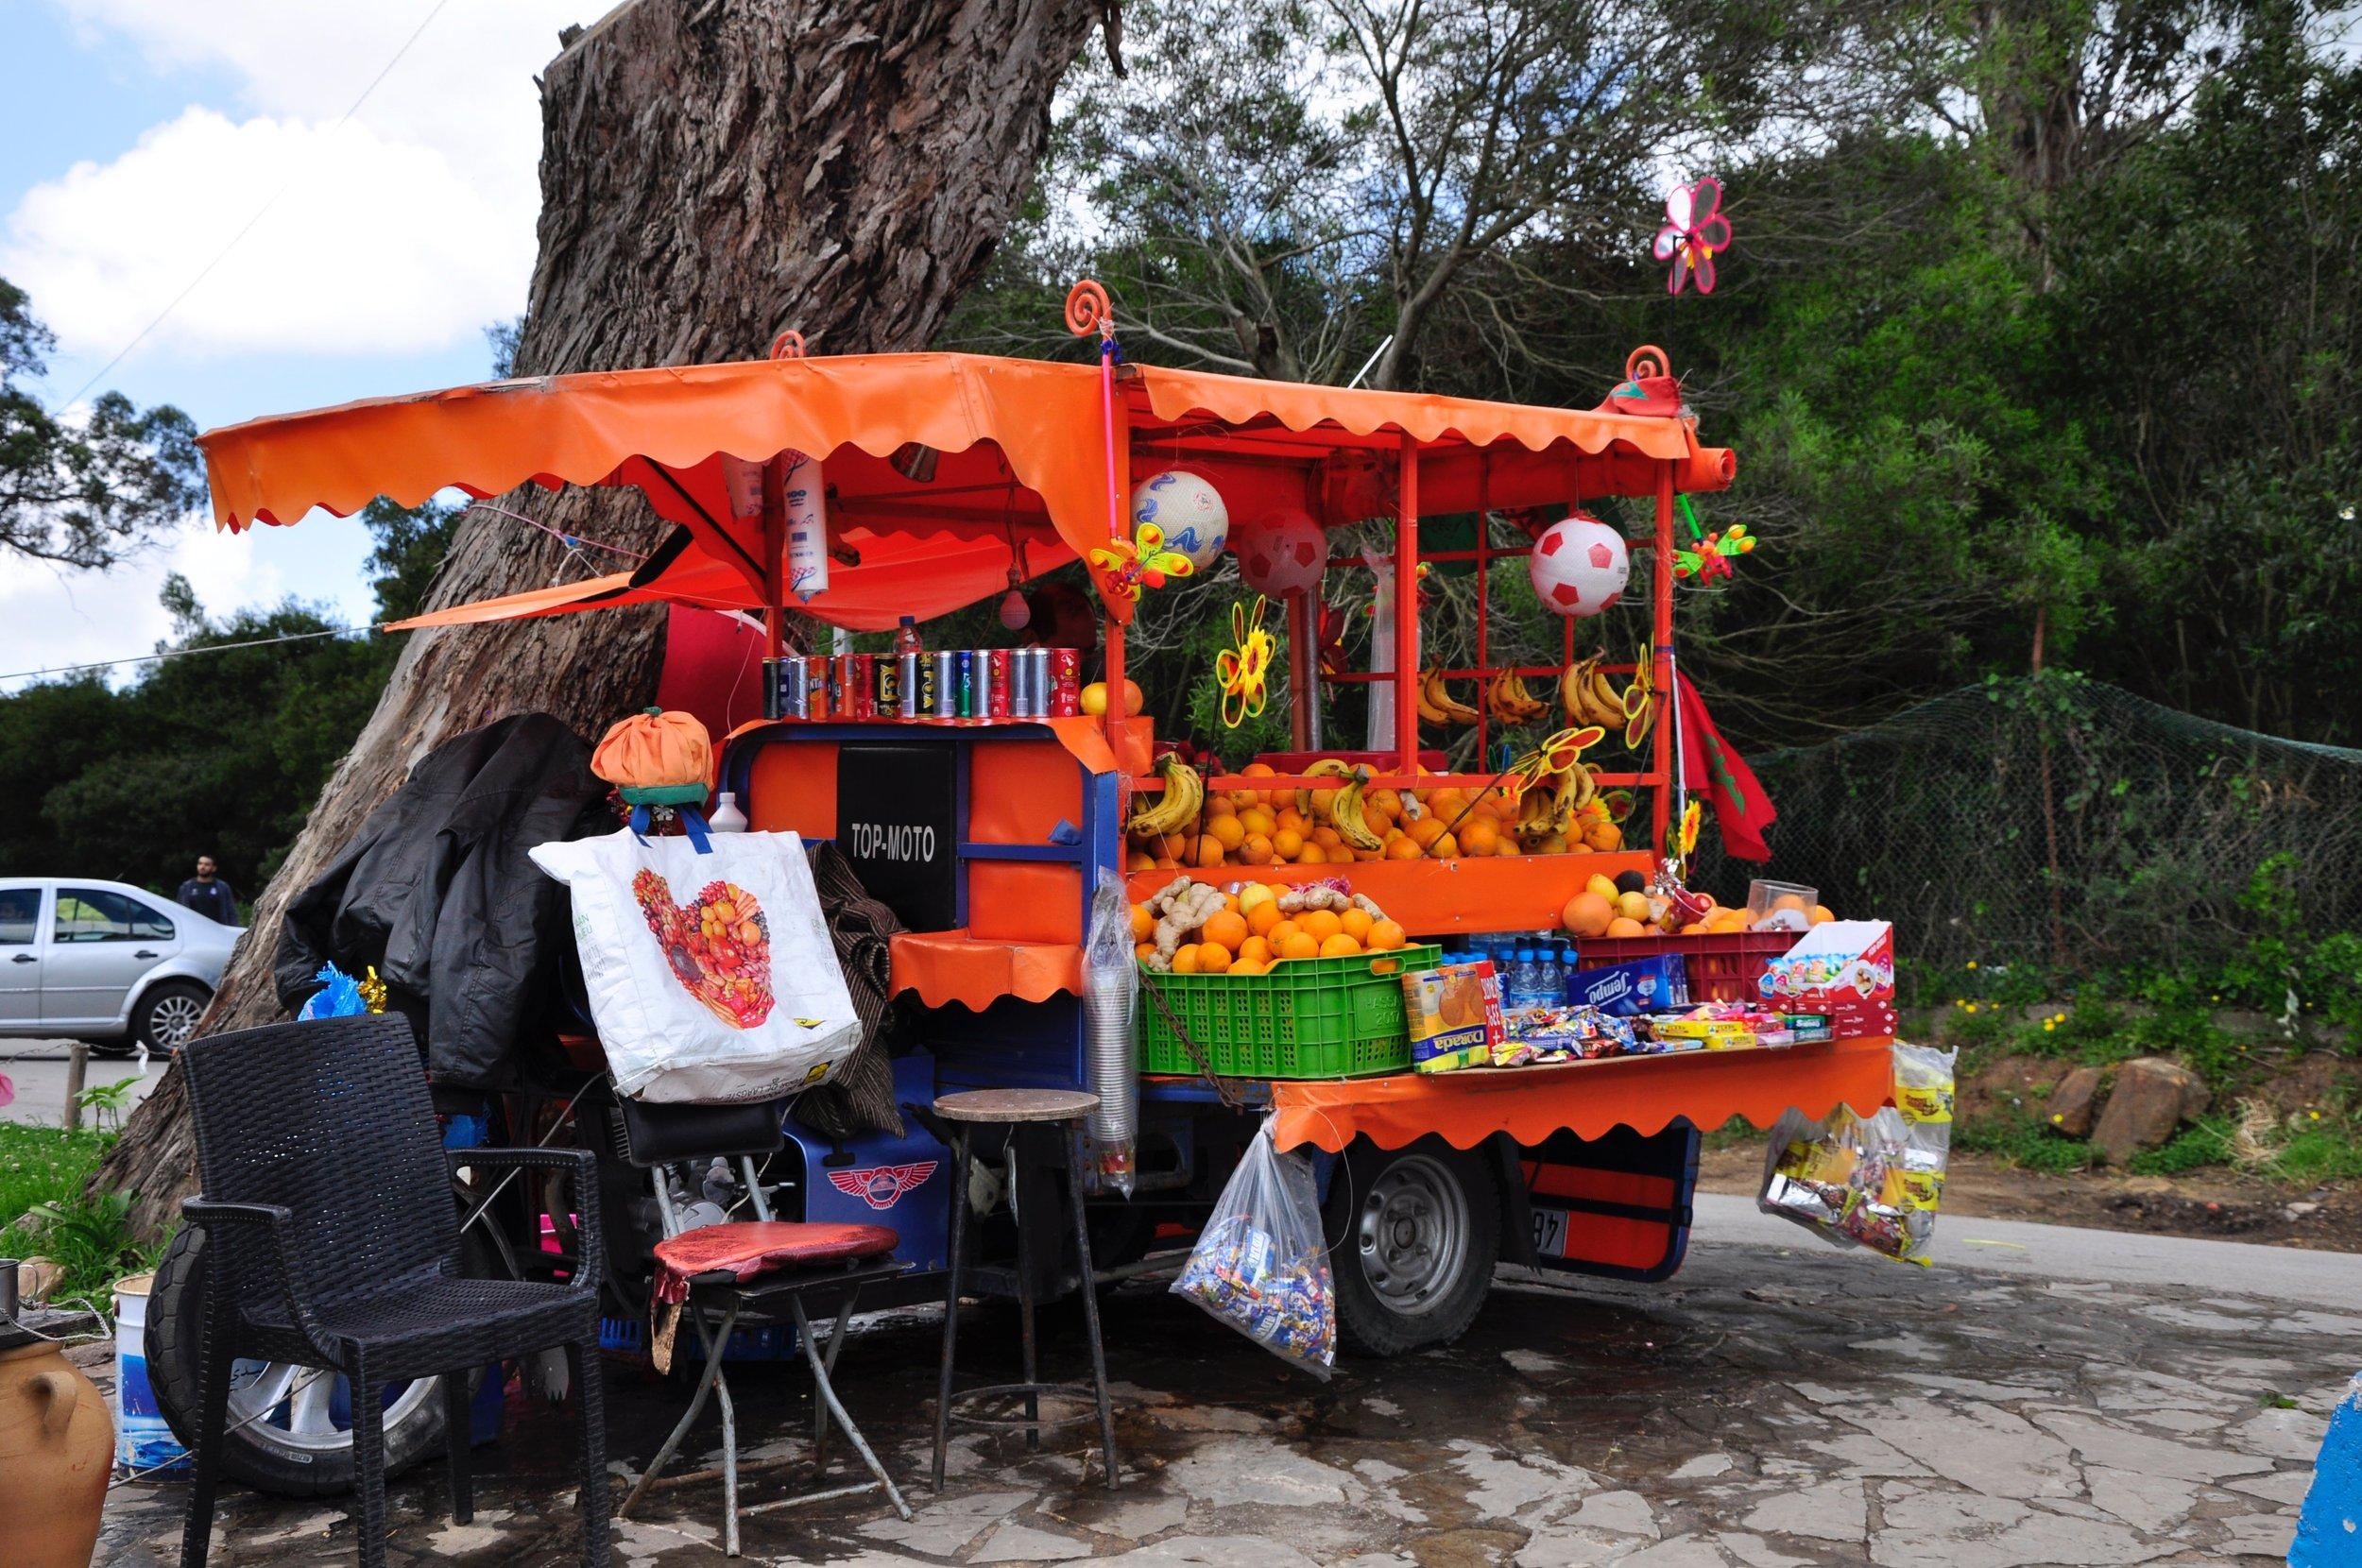 Perdicaris Park attraction